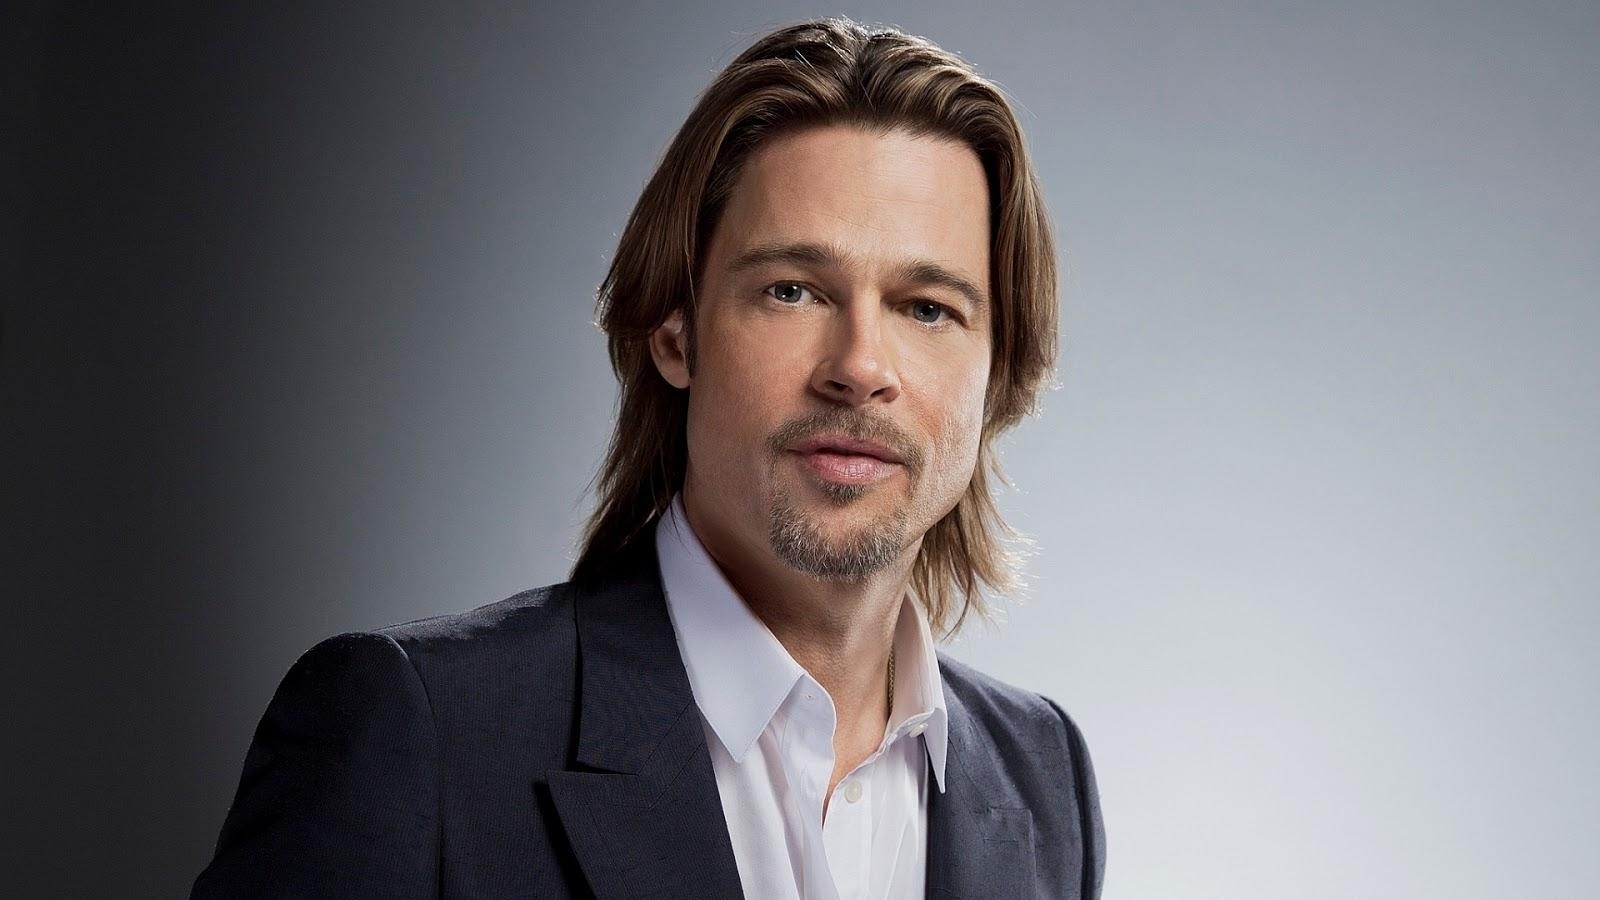 Famous Actor Brad Pitt